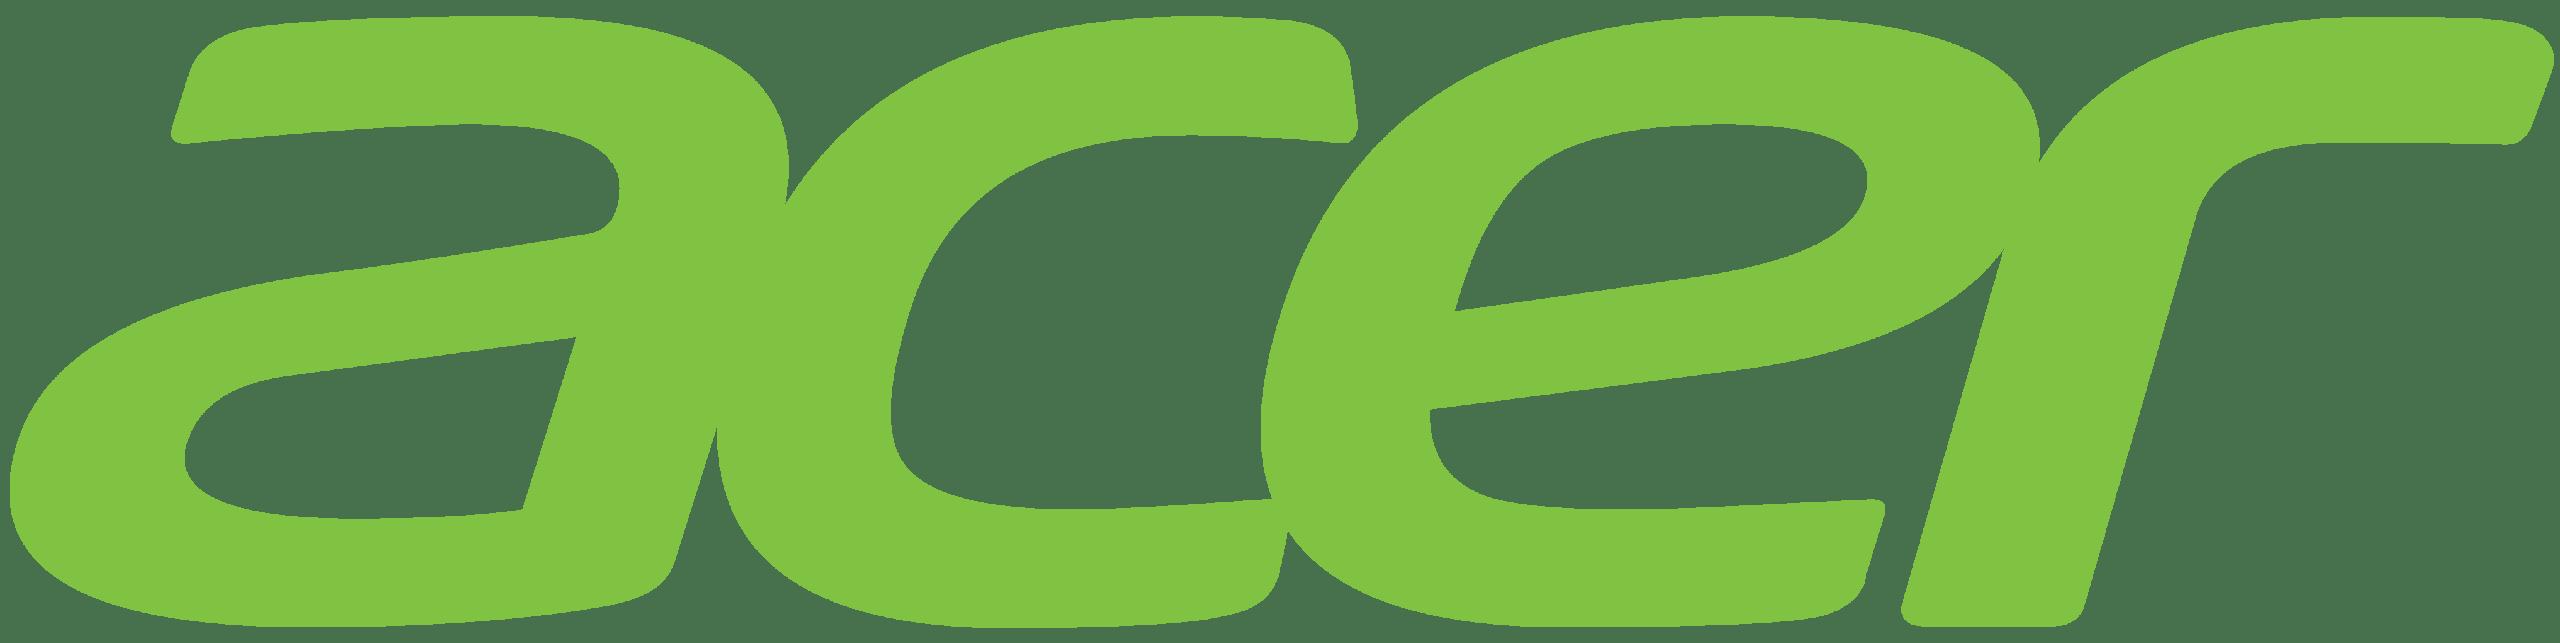 Acer-Service-Center